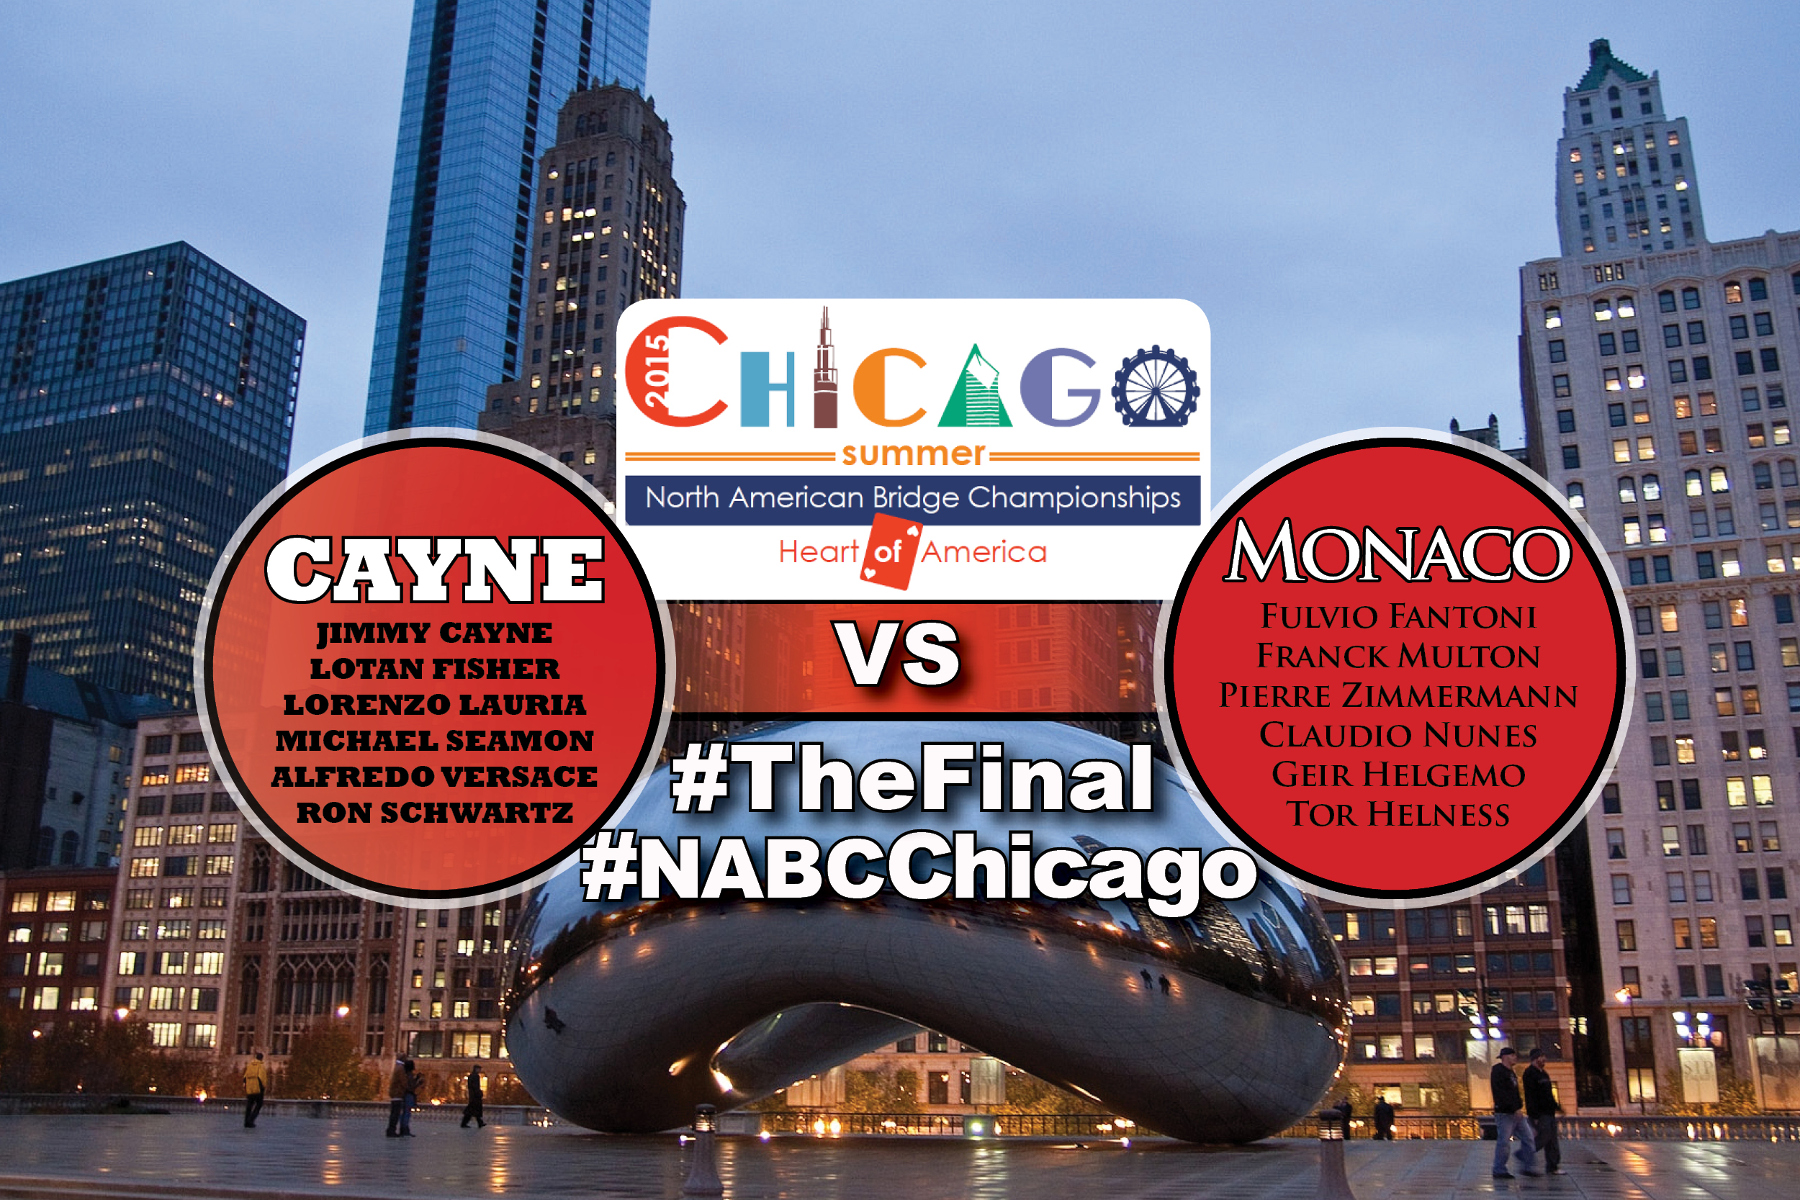 NABC a Chicago: notizie in breve